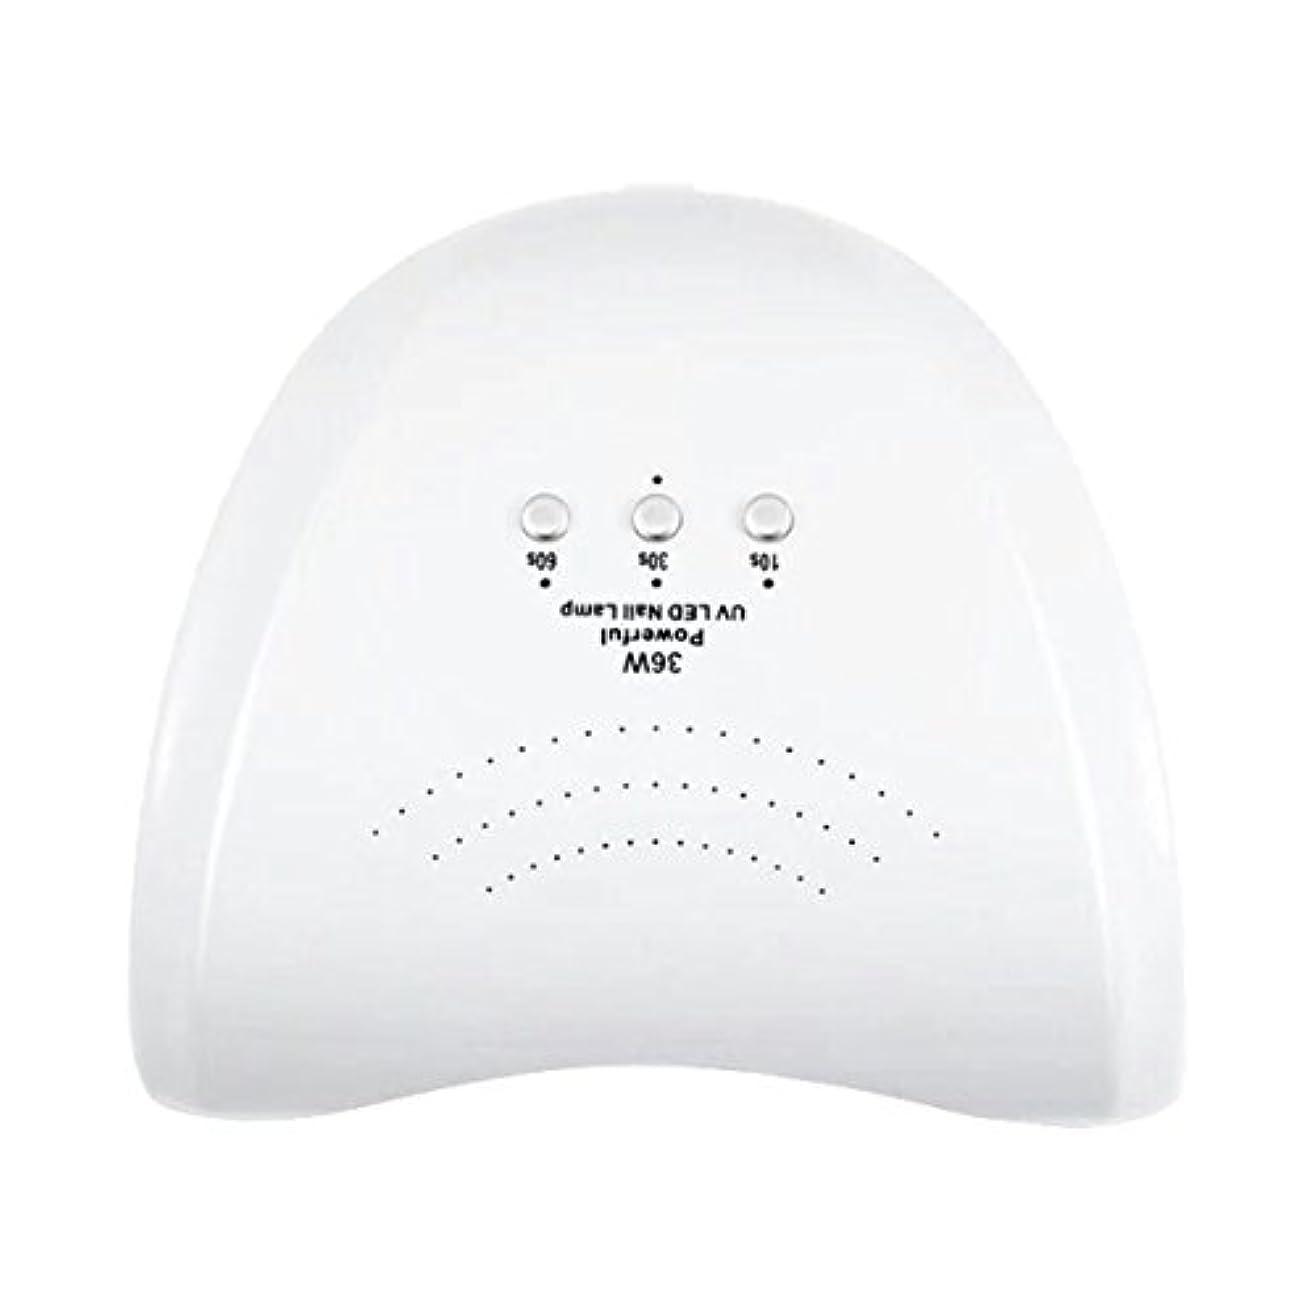 La Curie 36W LED&UVネイルライト CCFL不使用 自動センサー ジェルネイル レジン 6ヶ月保証&日本語説明書&プロネイリスト監修ネイルレシピ付き 全9色 (ホワイト) LaCurie004